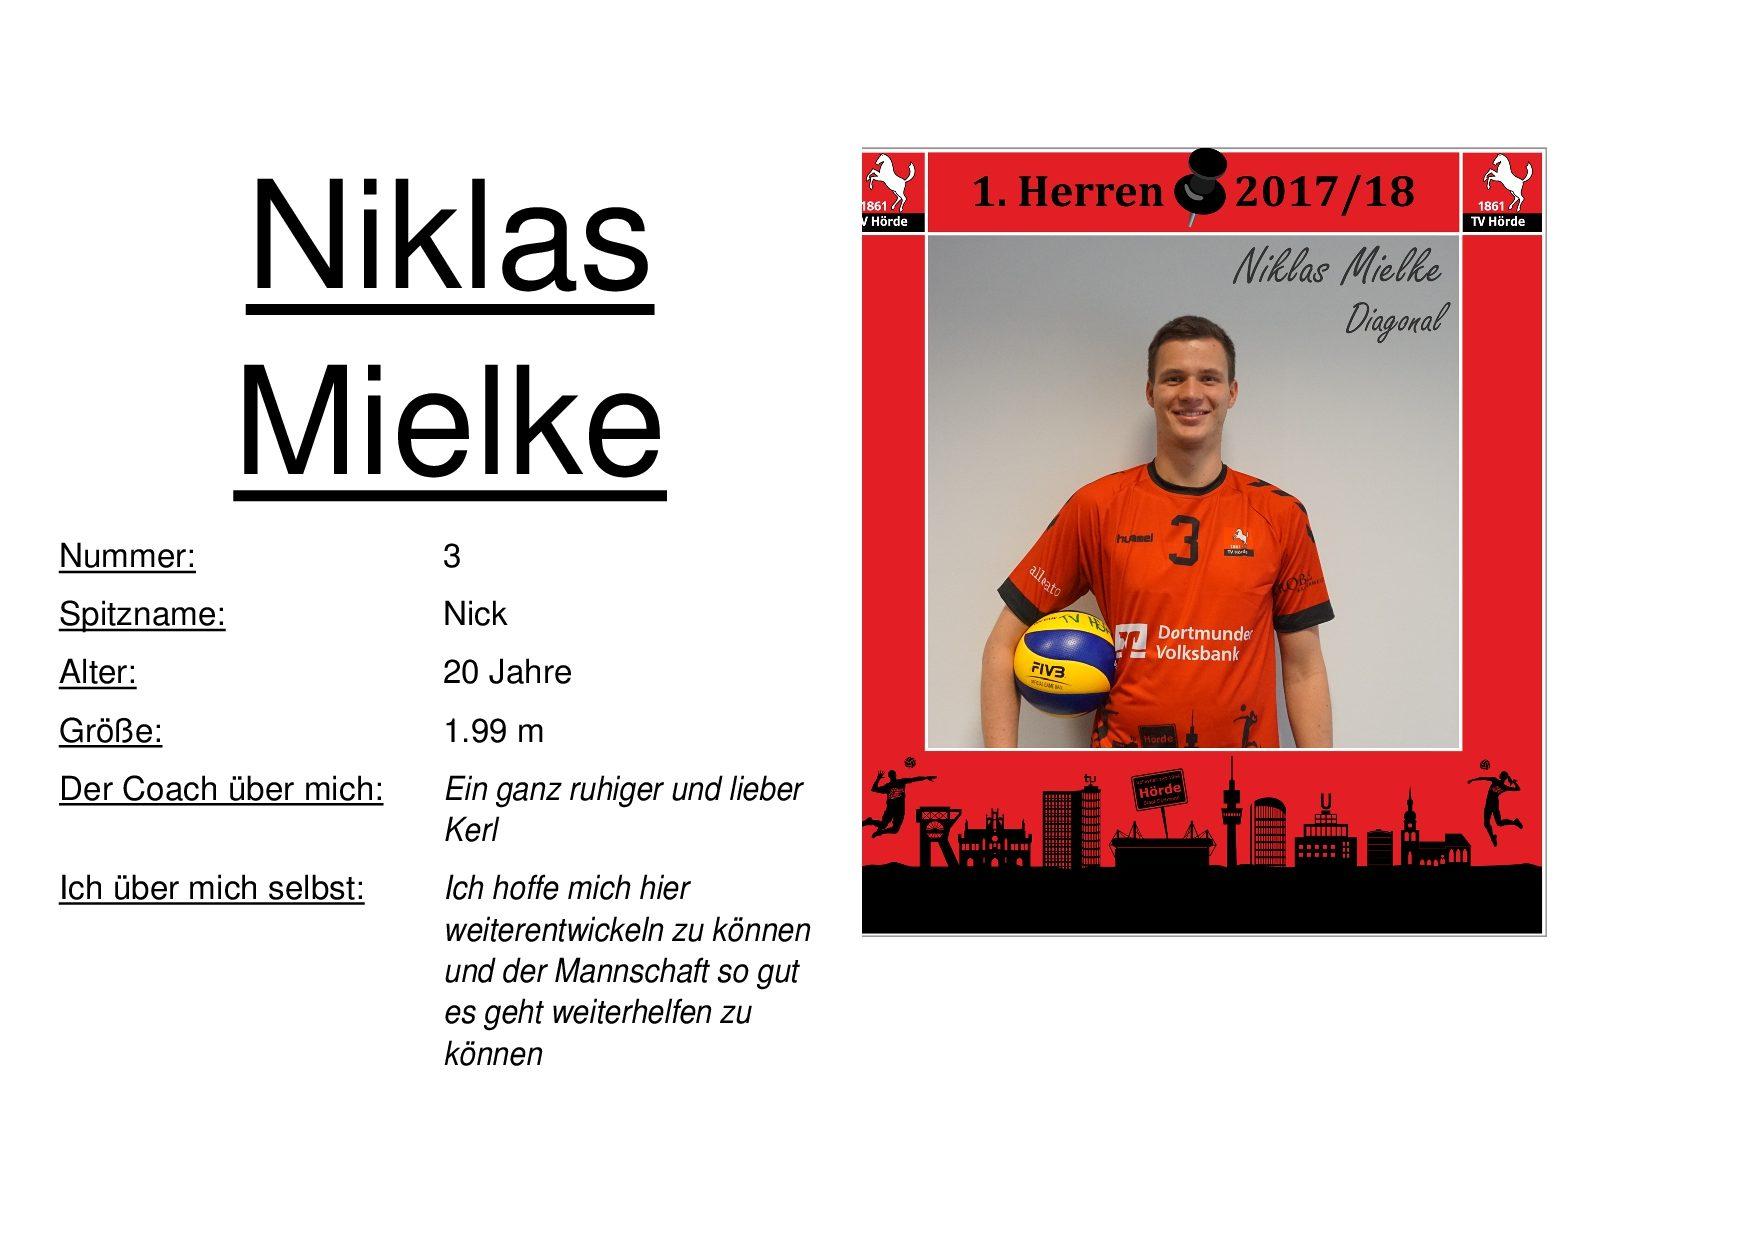 Niklas Mielke